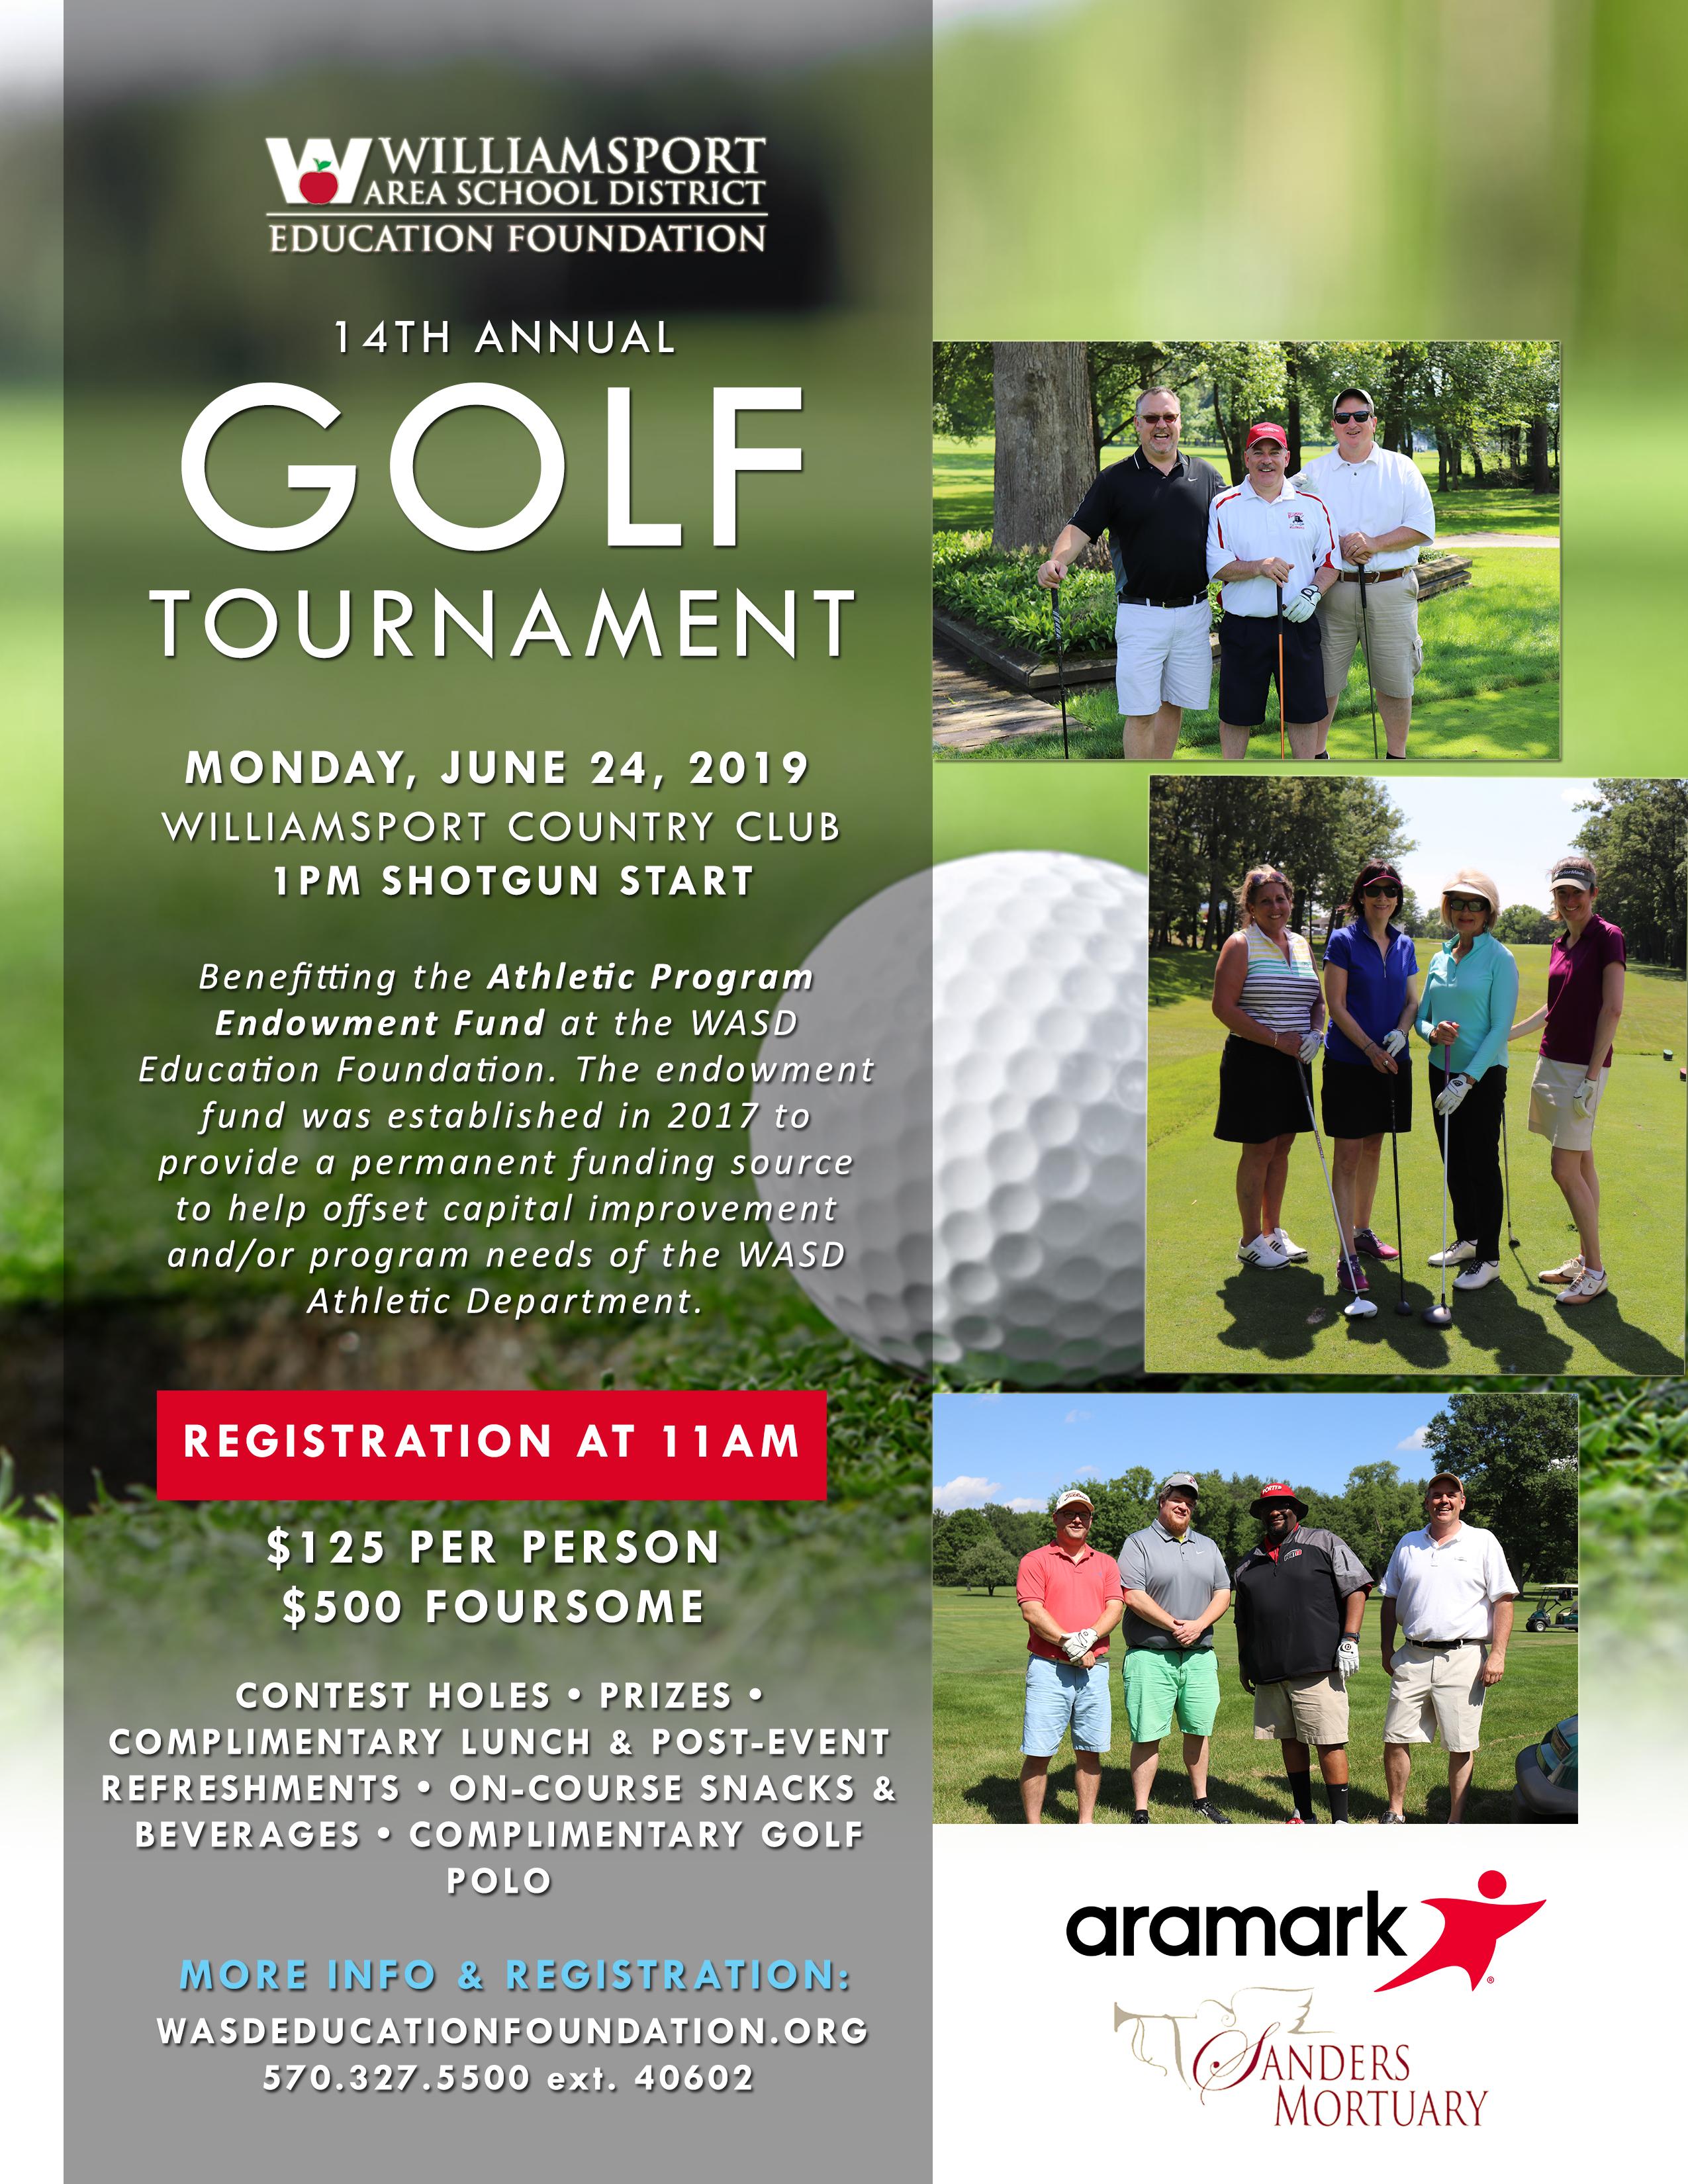 WASD Education Foundation Announces 14th Annual Golf Tournament Event Details